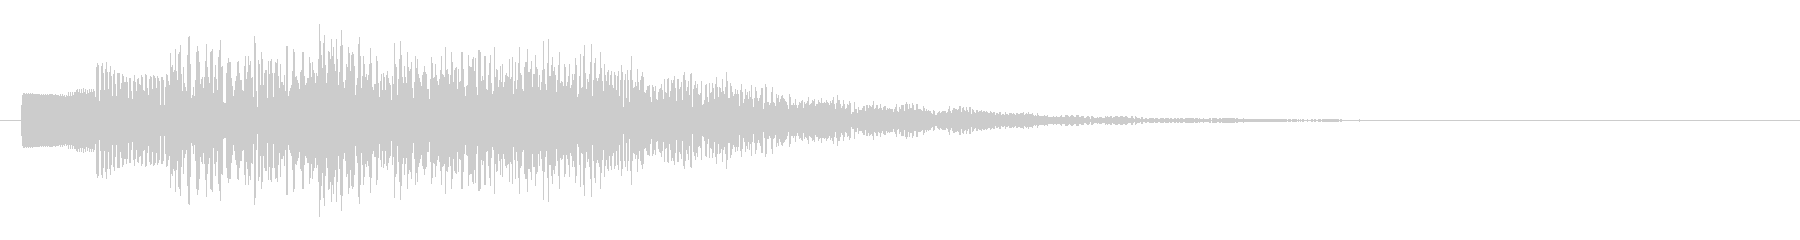 KANTベルサウンドジングル73の未再生の波形